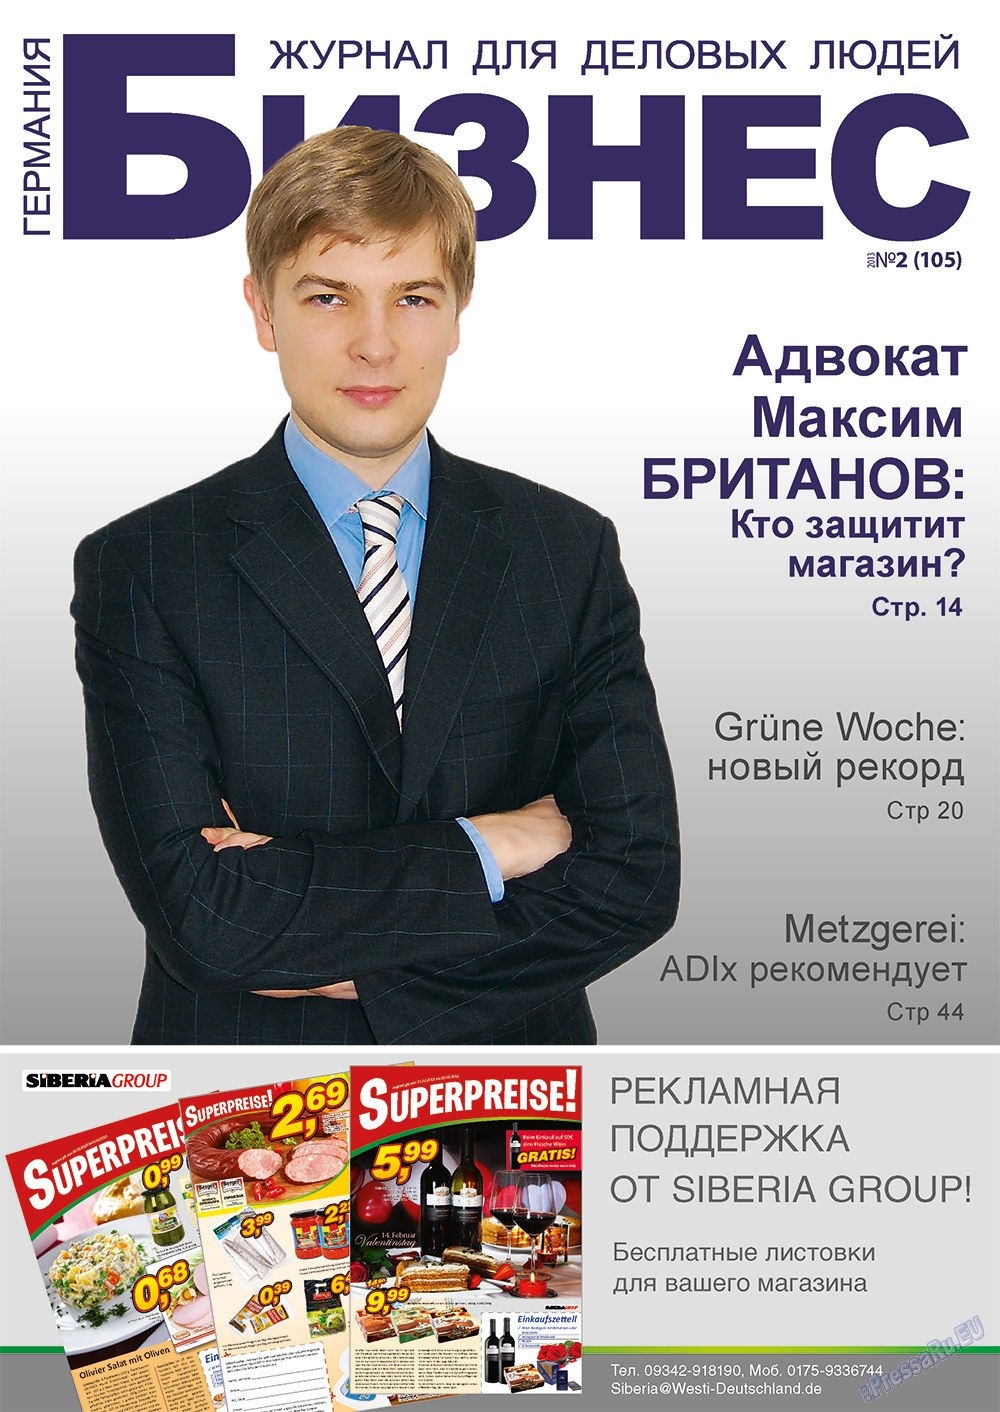 Бизнес (журнал). 2013 год, номер 2, стр. 1